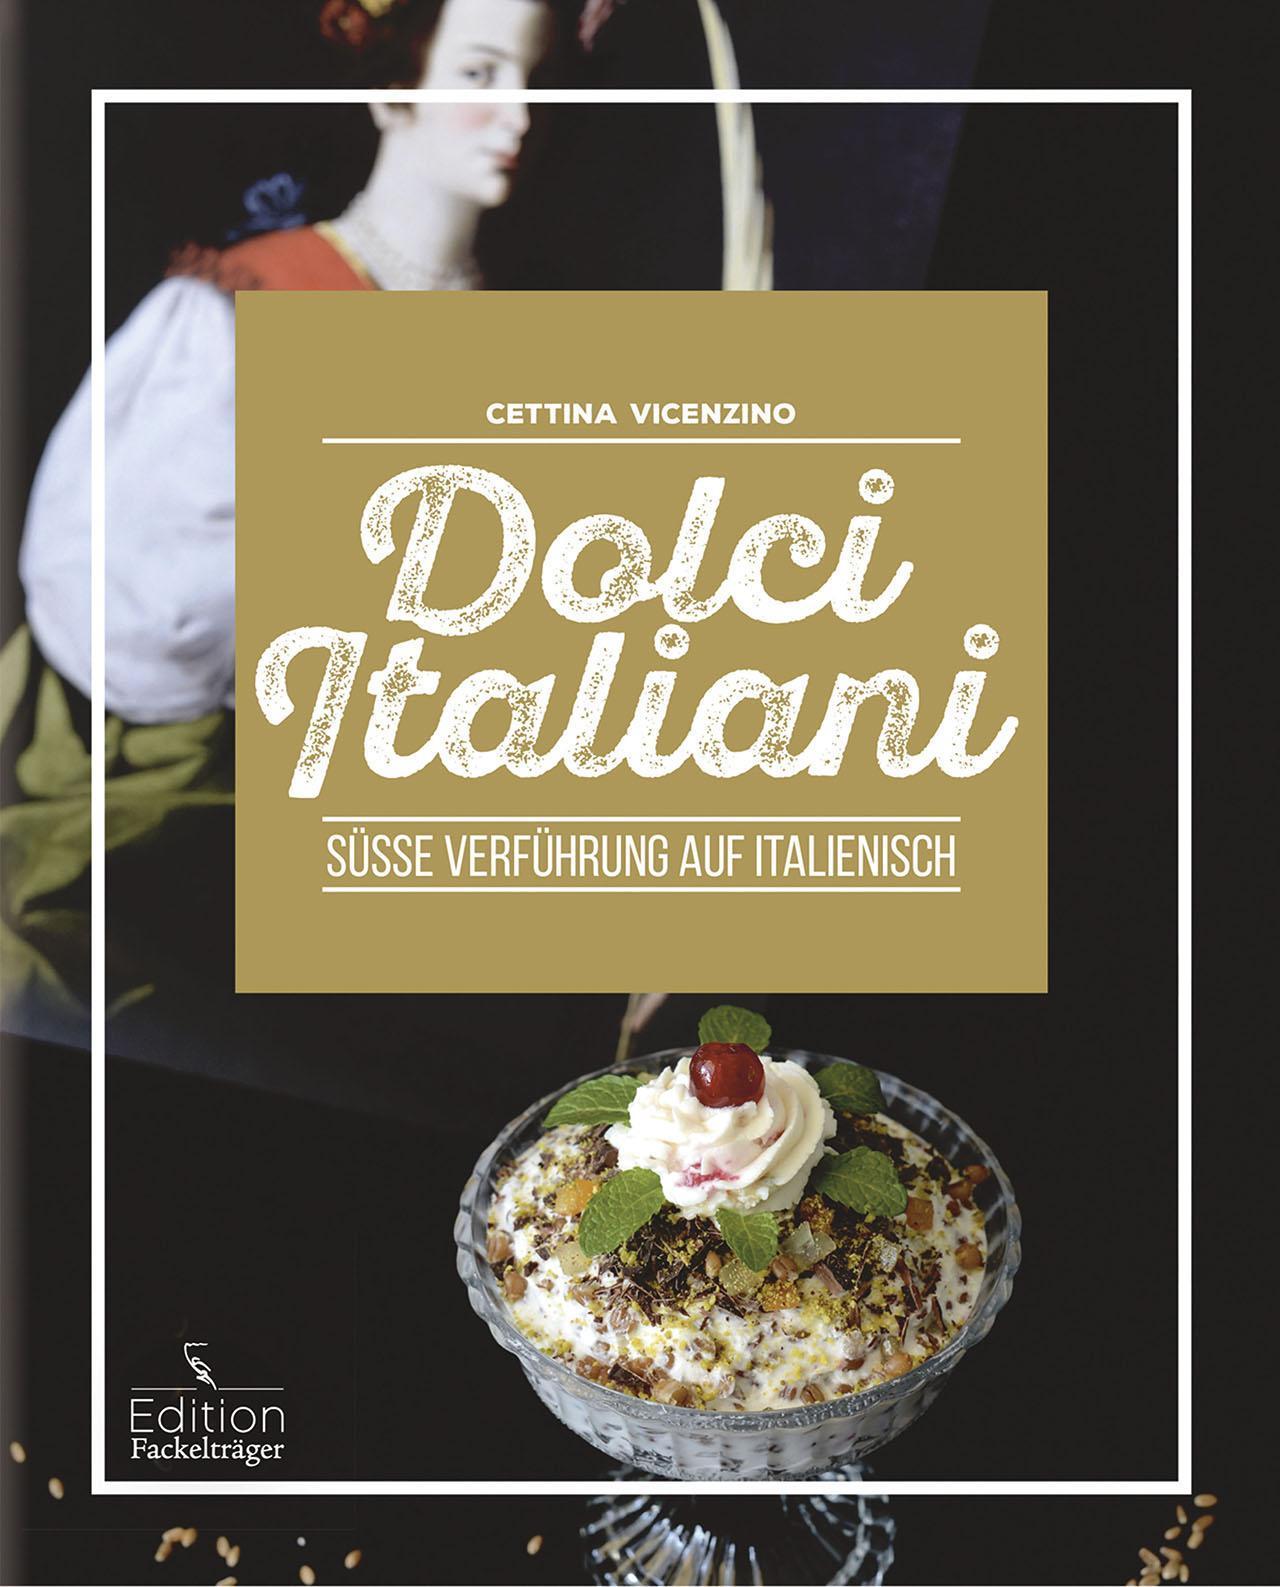 Italienisch Backen: Amazon.de: Oetker: Bücher